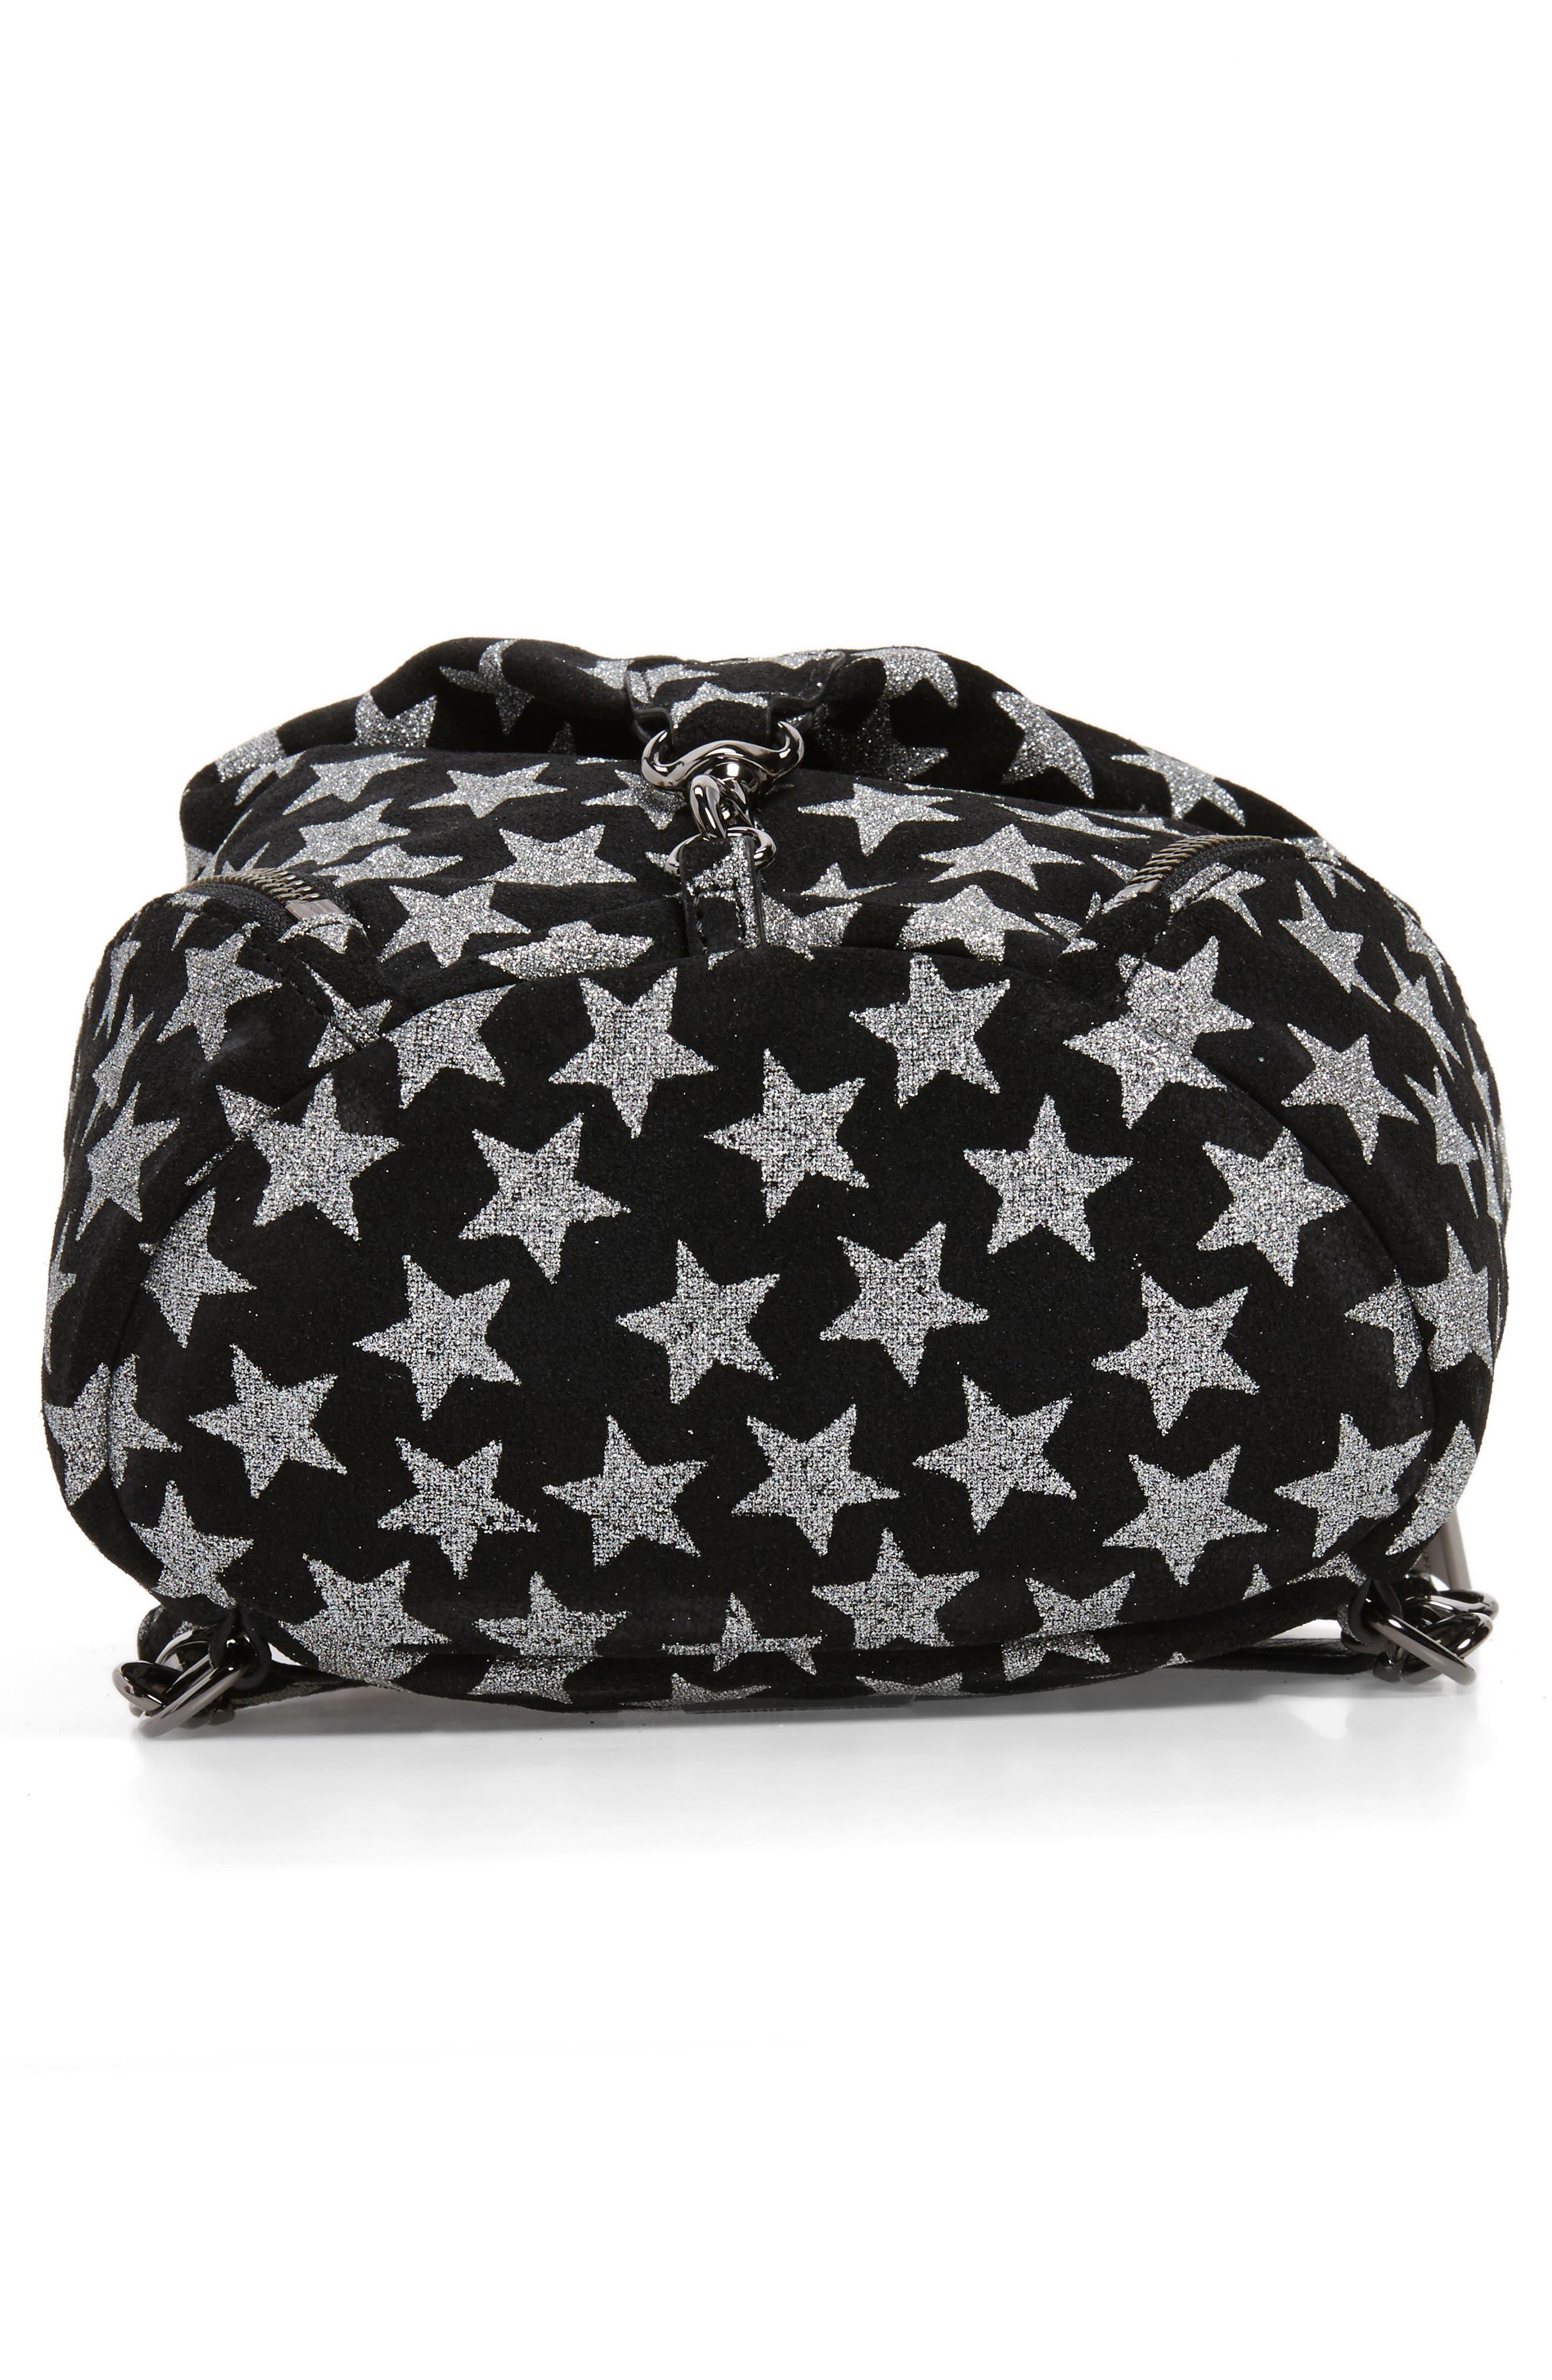 Mini Julian Metallic Star Nubuck Leather Convertible Backpack,                             Alternate thumbnail 6, color,                             Black